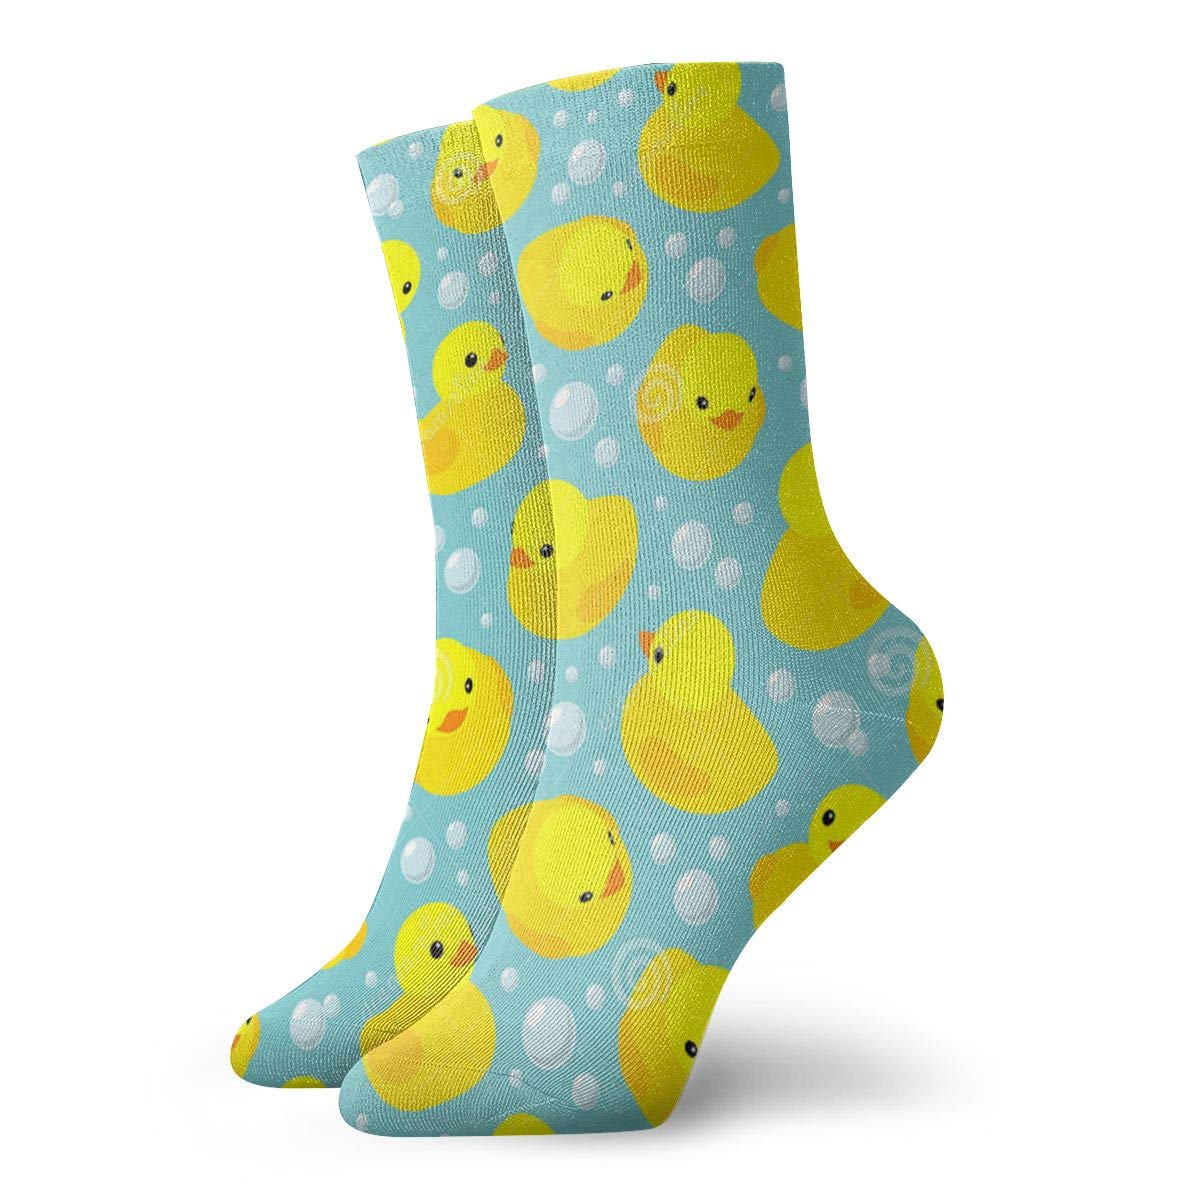 Yellow-rubber-ducks Unisex Funny Casual Crew Socks Athletic Socks For Boys Girls Kids Teenagers